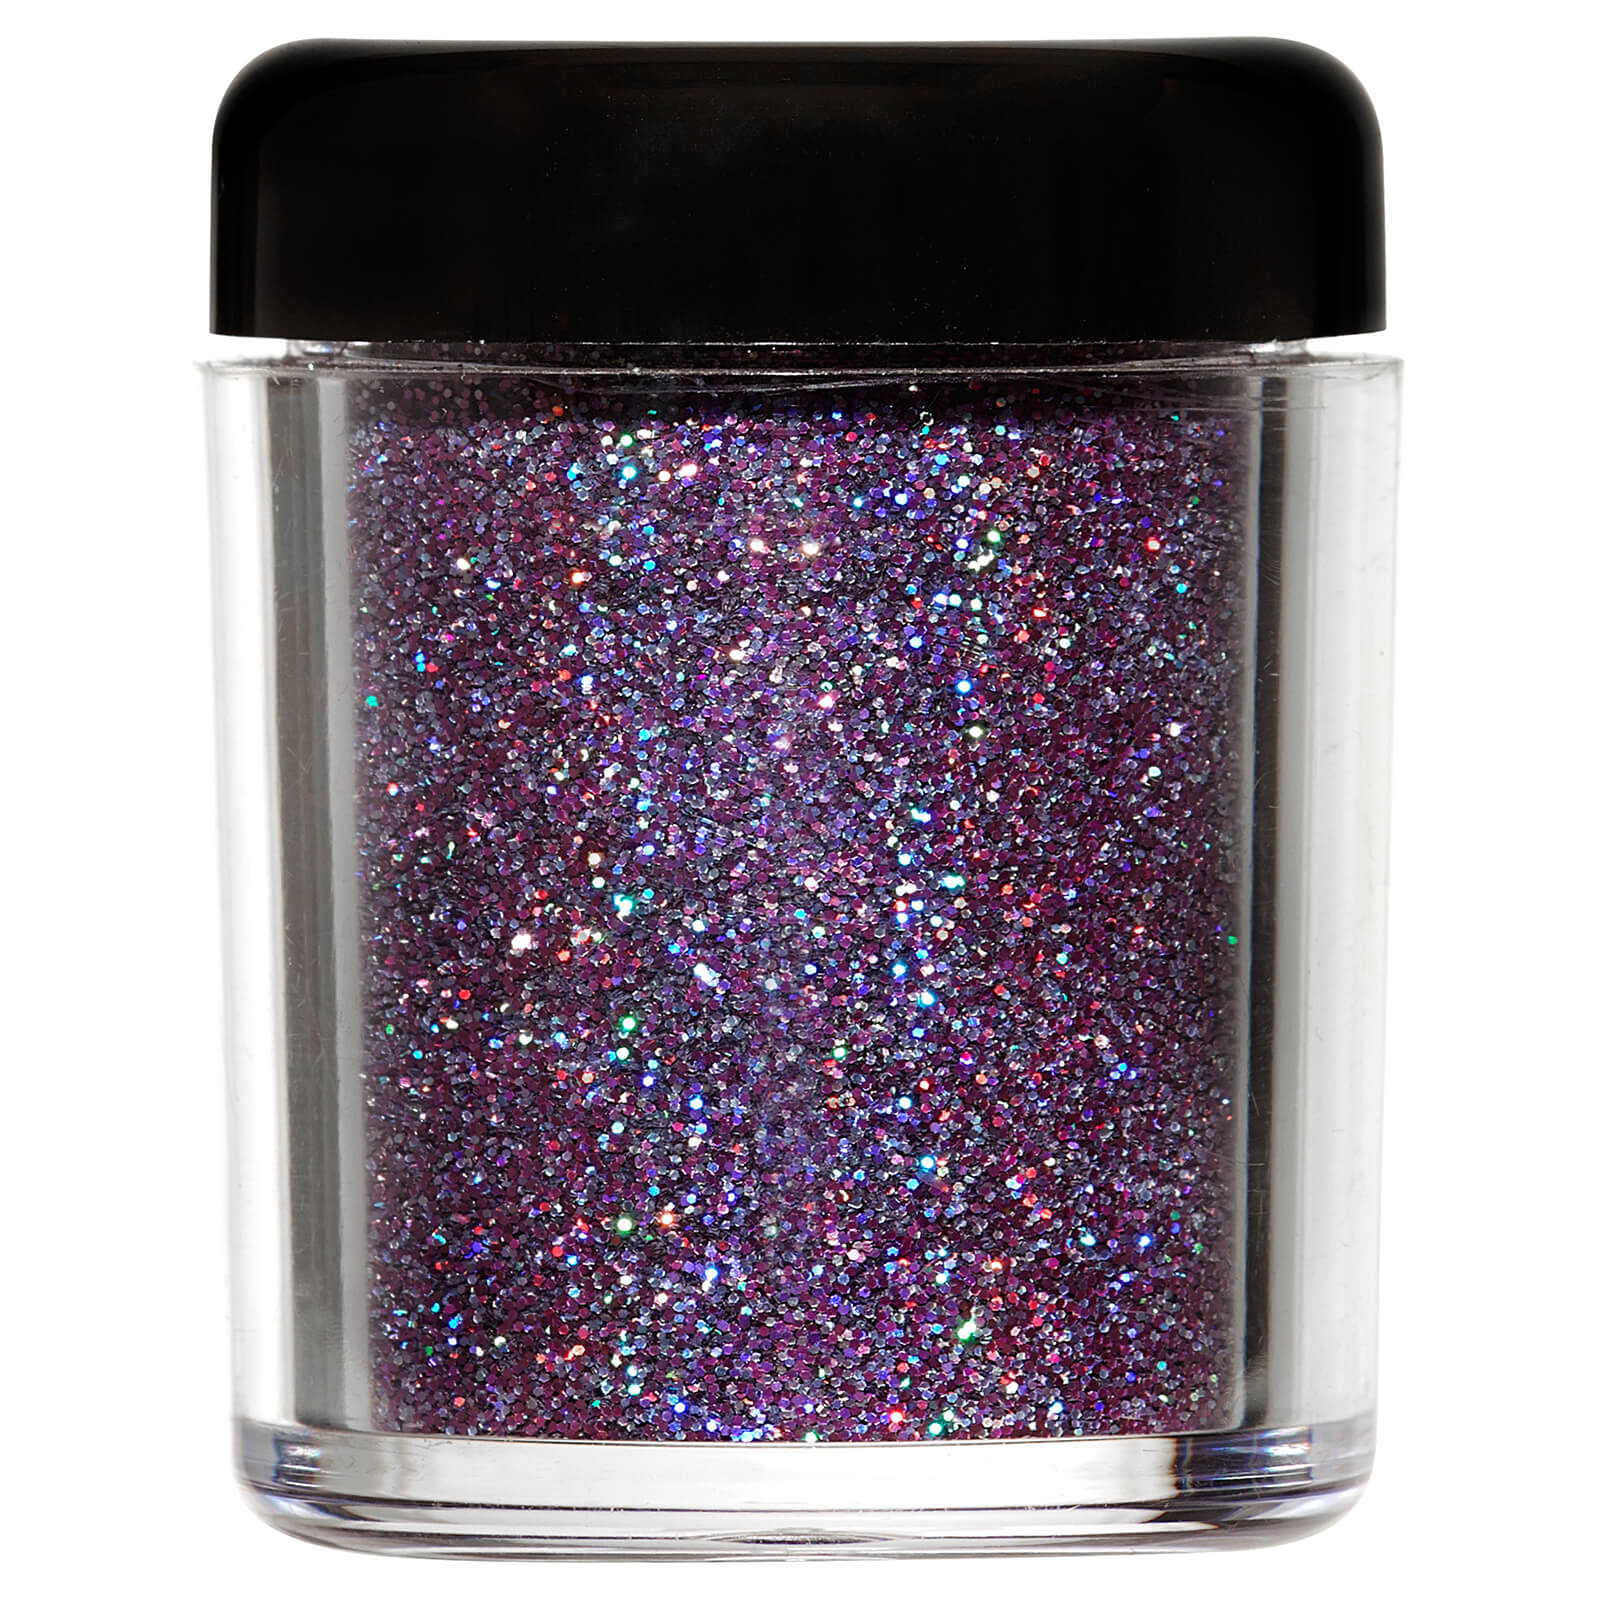 Barry M Cosmetics Glitter Rush Body Glitter (Various Shades) - Ultraviolet